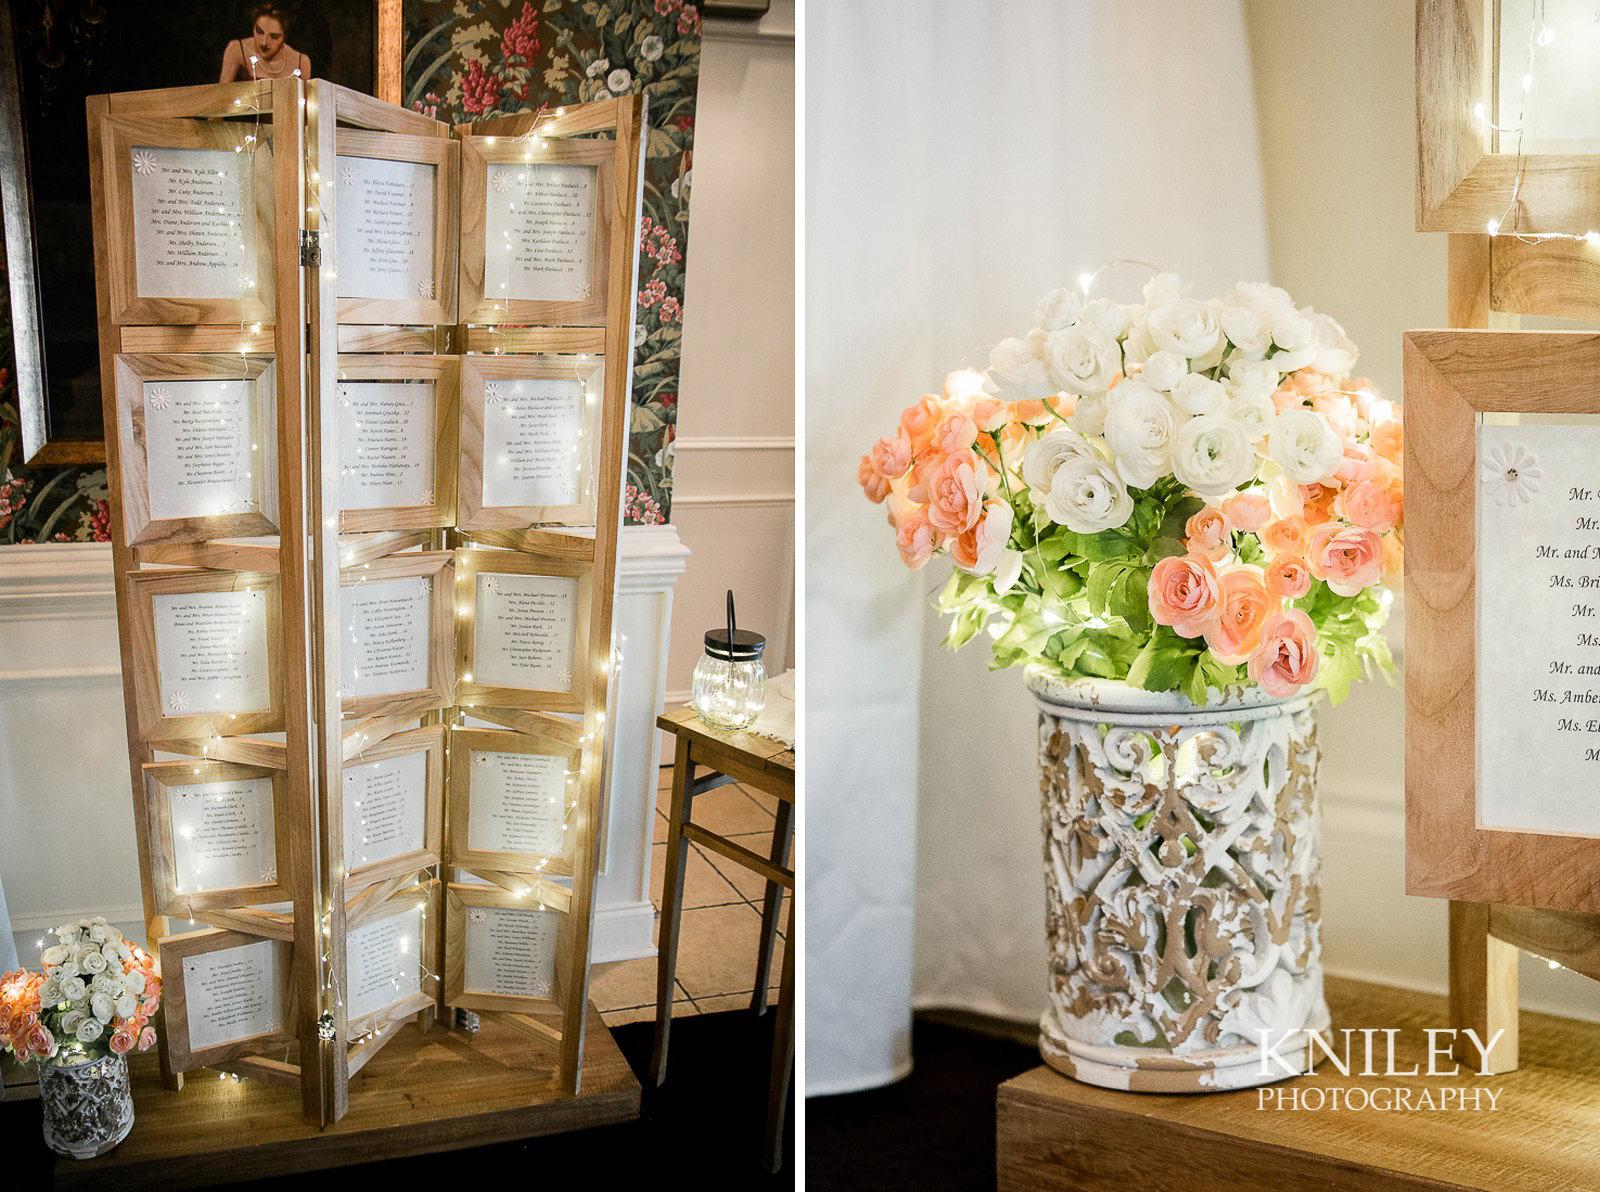 086 Buffalo NY wedding pictures - Sean Patrick Restaurant Wedding Reception - Getzville.jpg